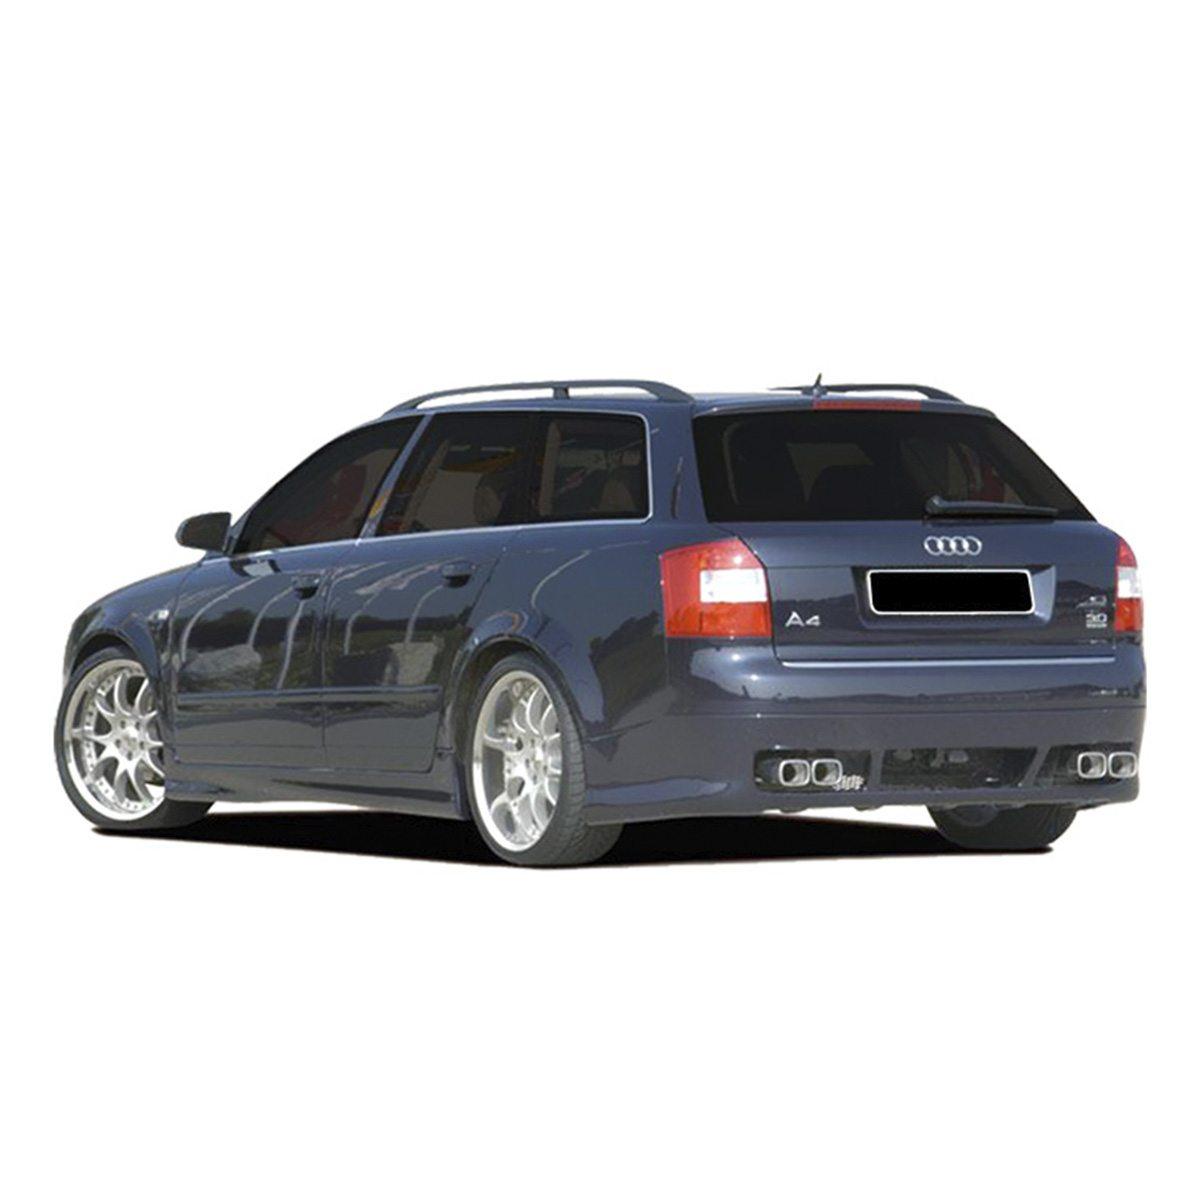 Spoiler-Audi-A4-Tras-SPU0033.1